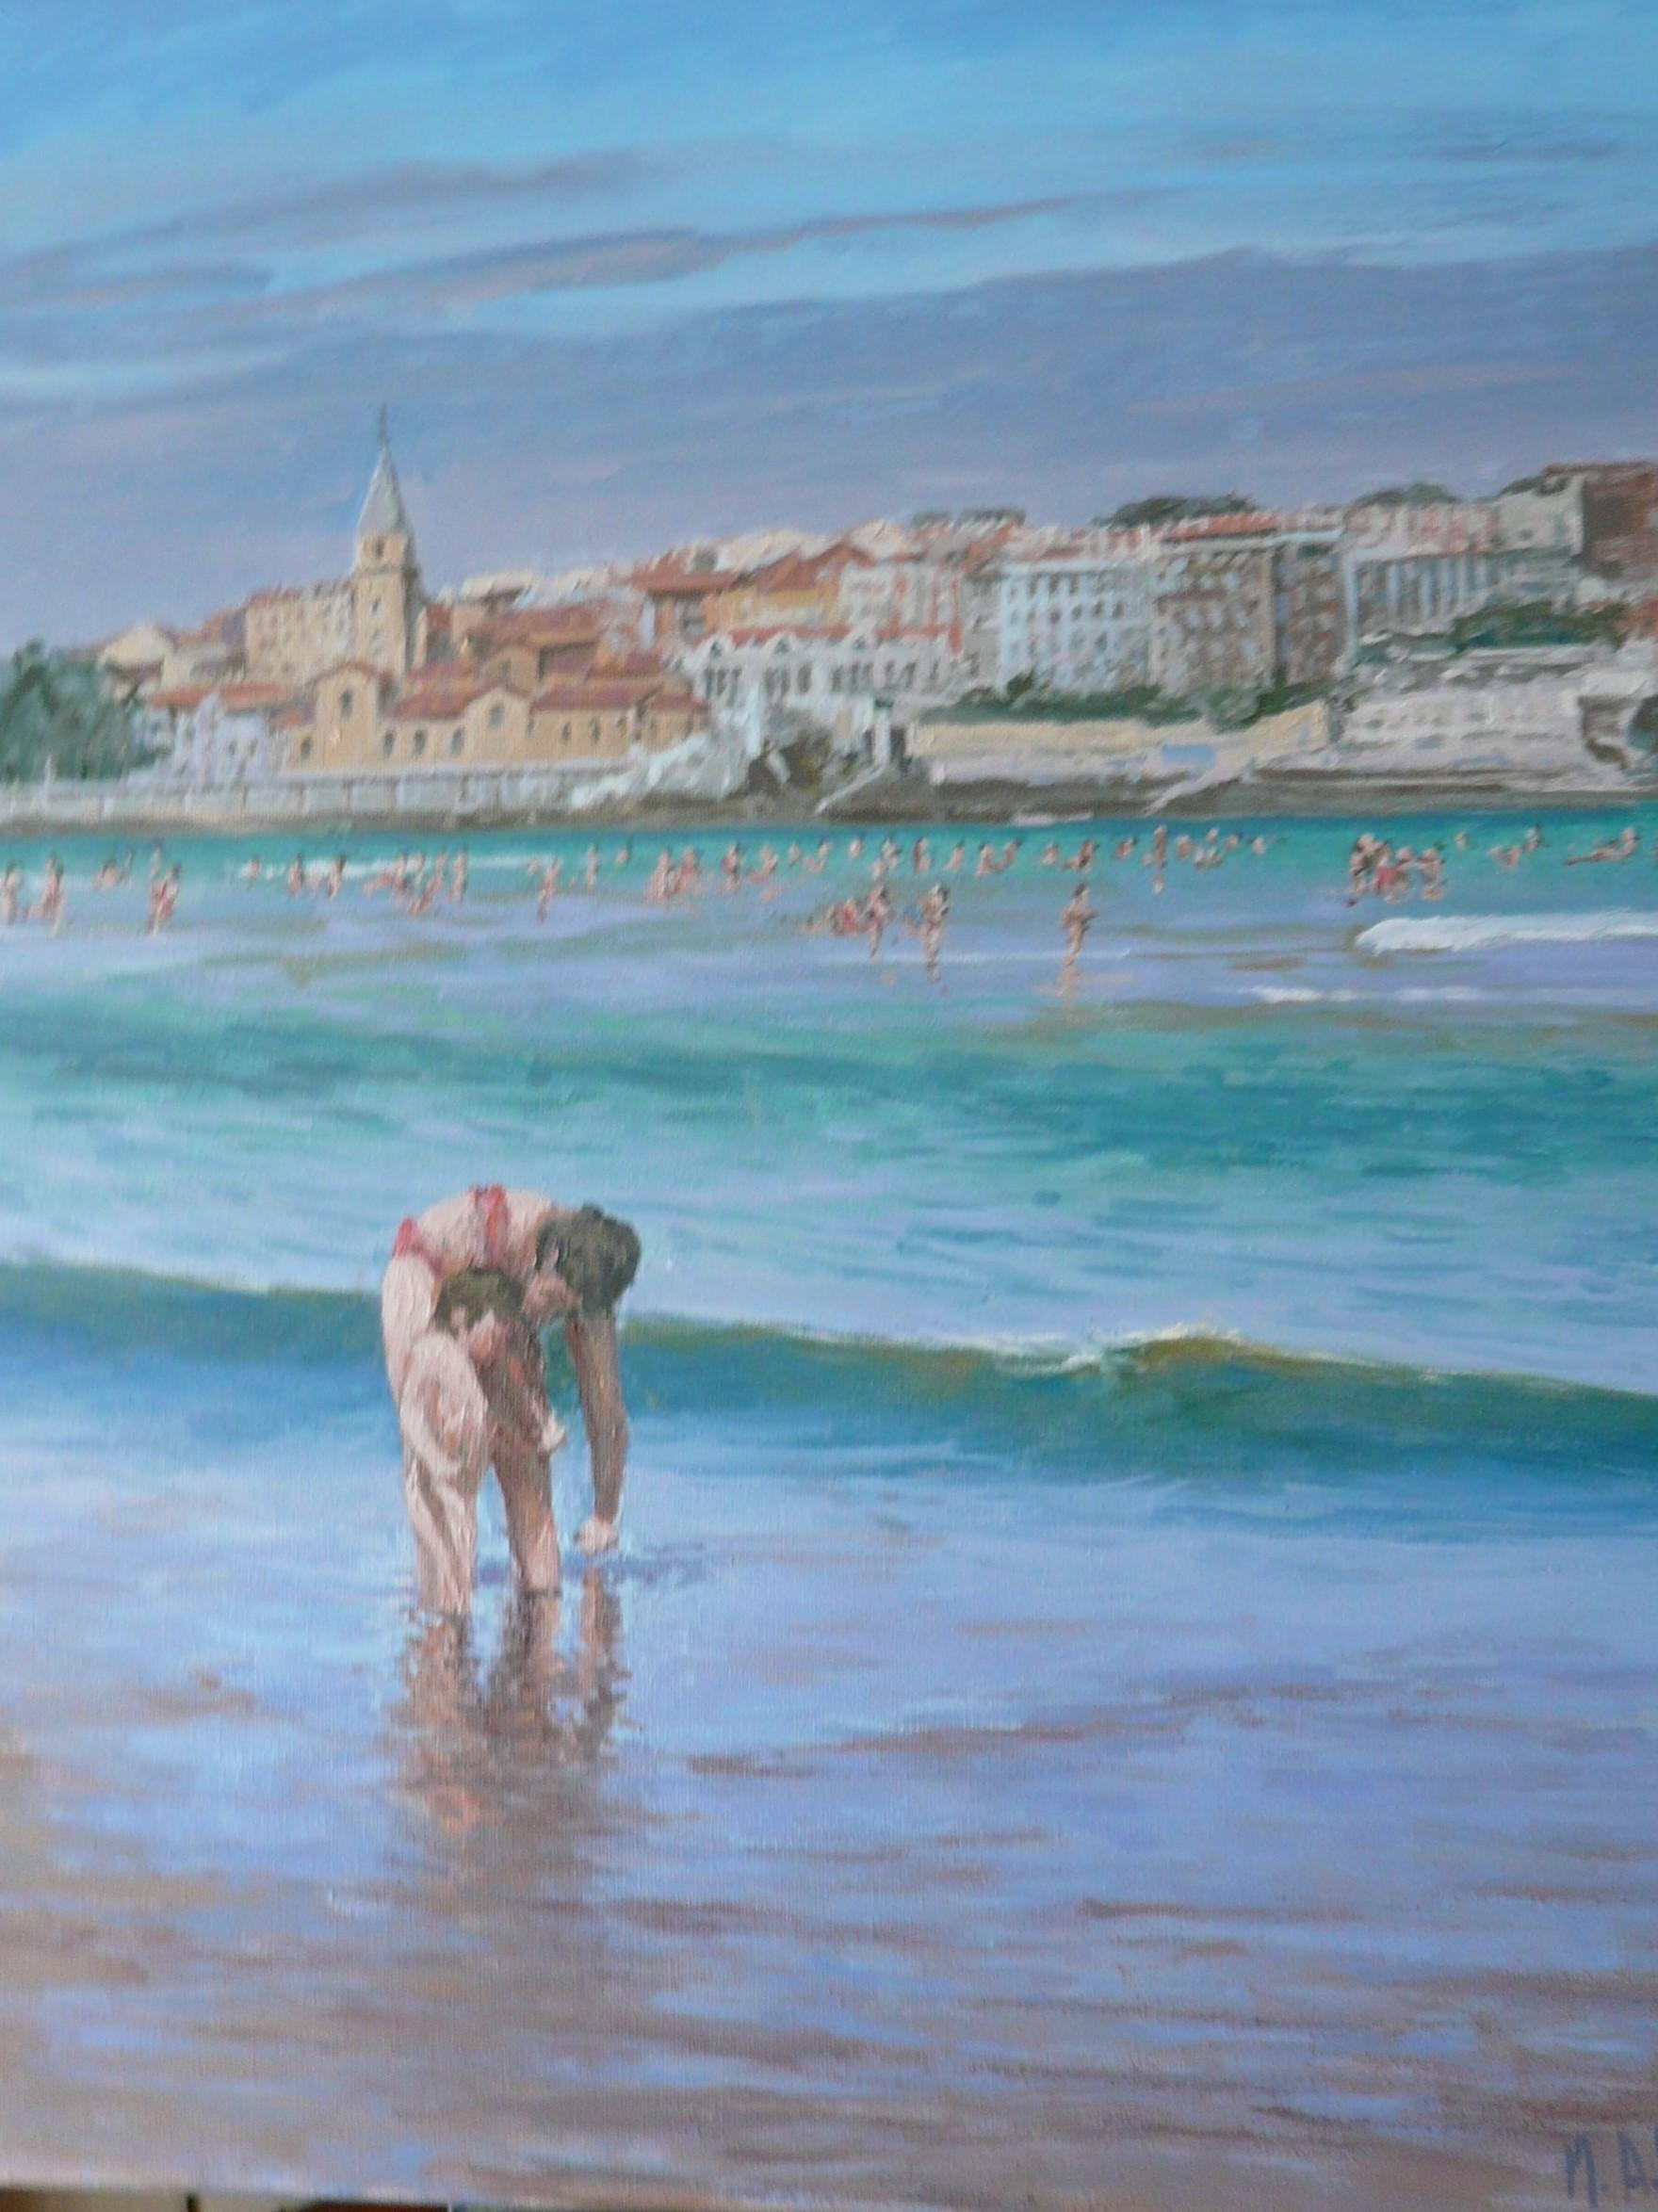 playa de S. Lorenzo, Gijón (2020) - Miguel Ángel Velasco Diez